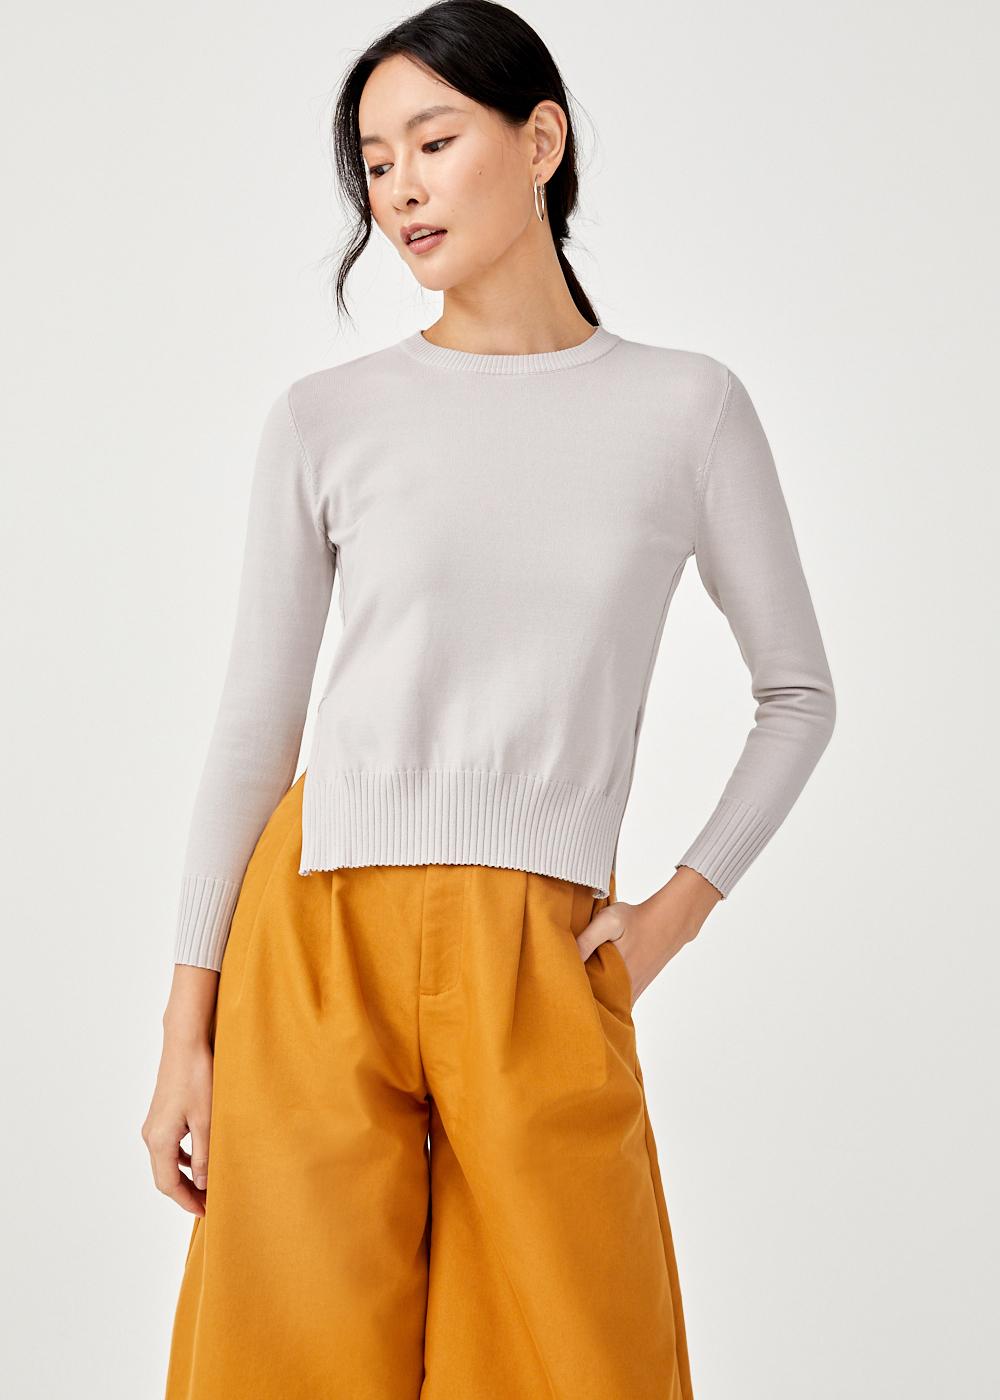 Xael Slit Hem Knit Sweater